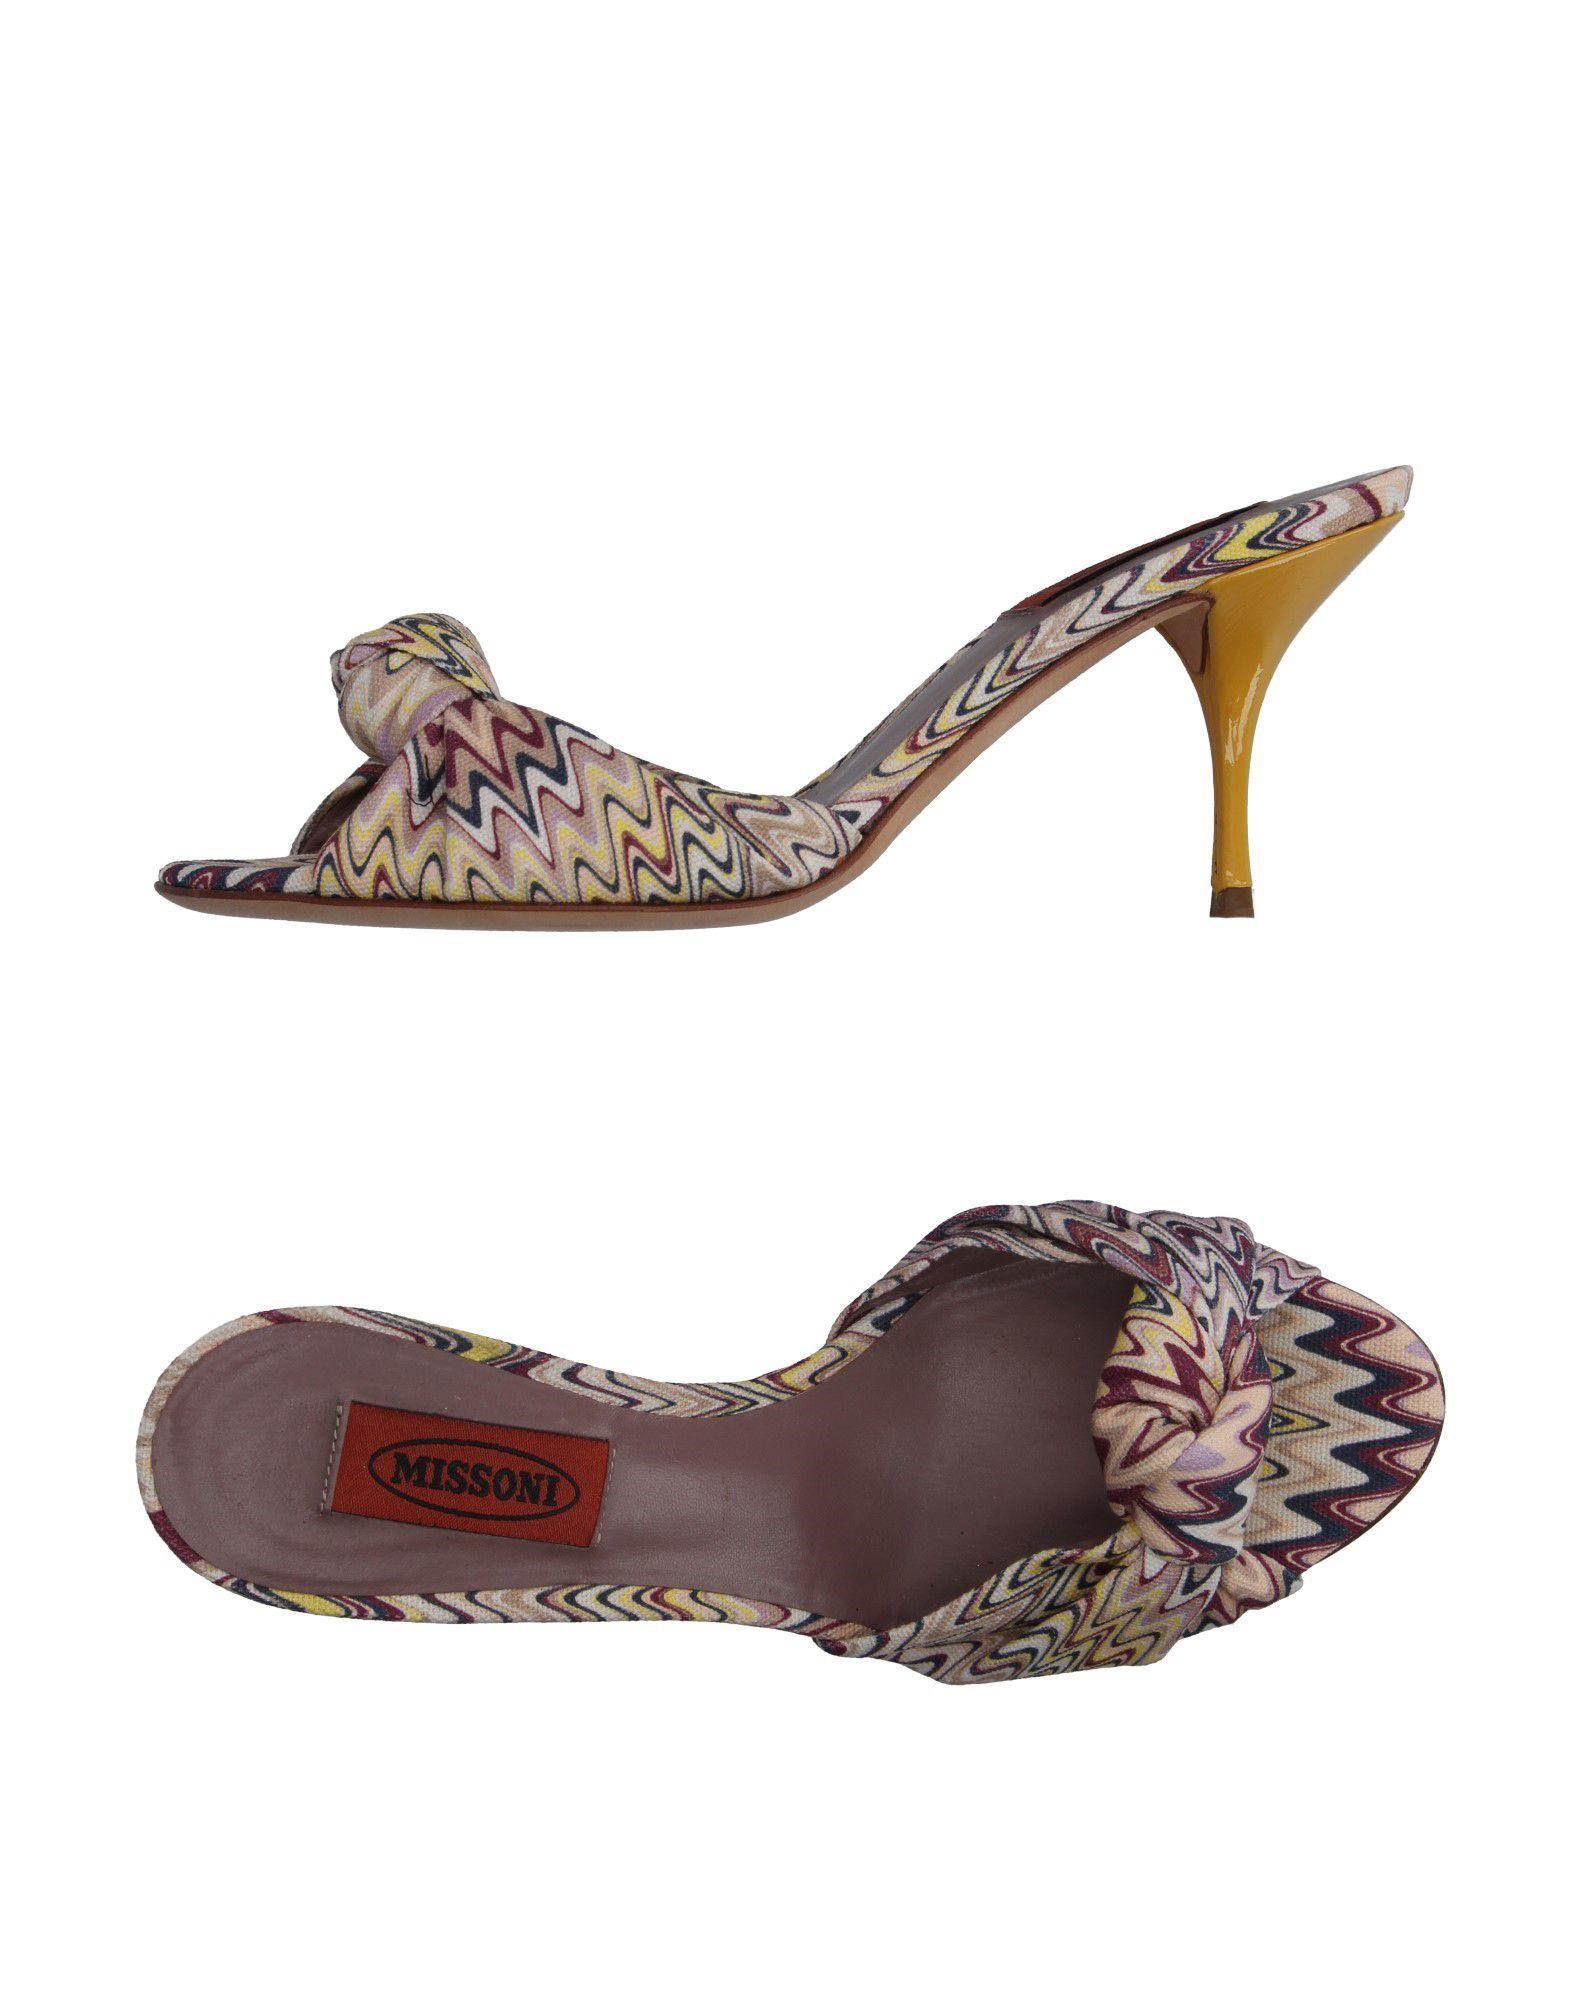 Missoni Canvases Sandals